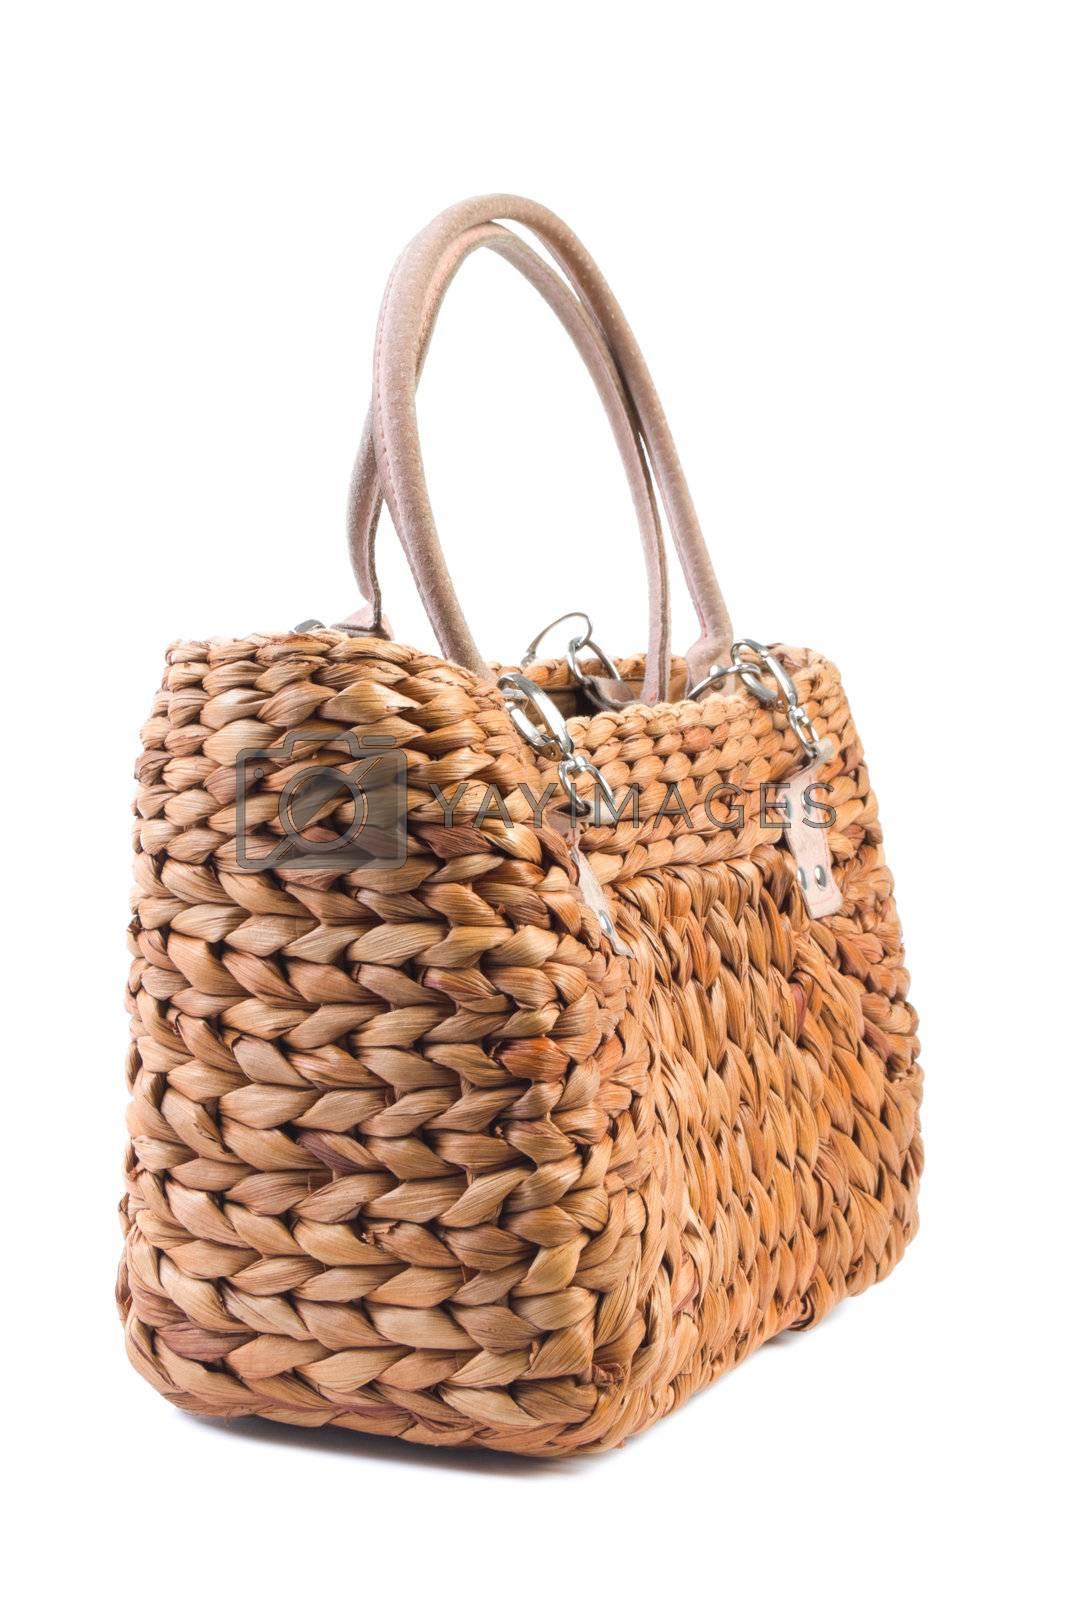 Royalty free image of Wattled bag   Isolated by zakaz